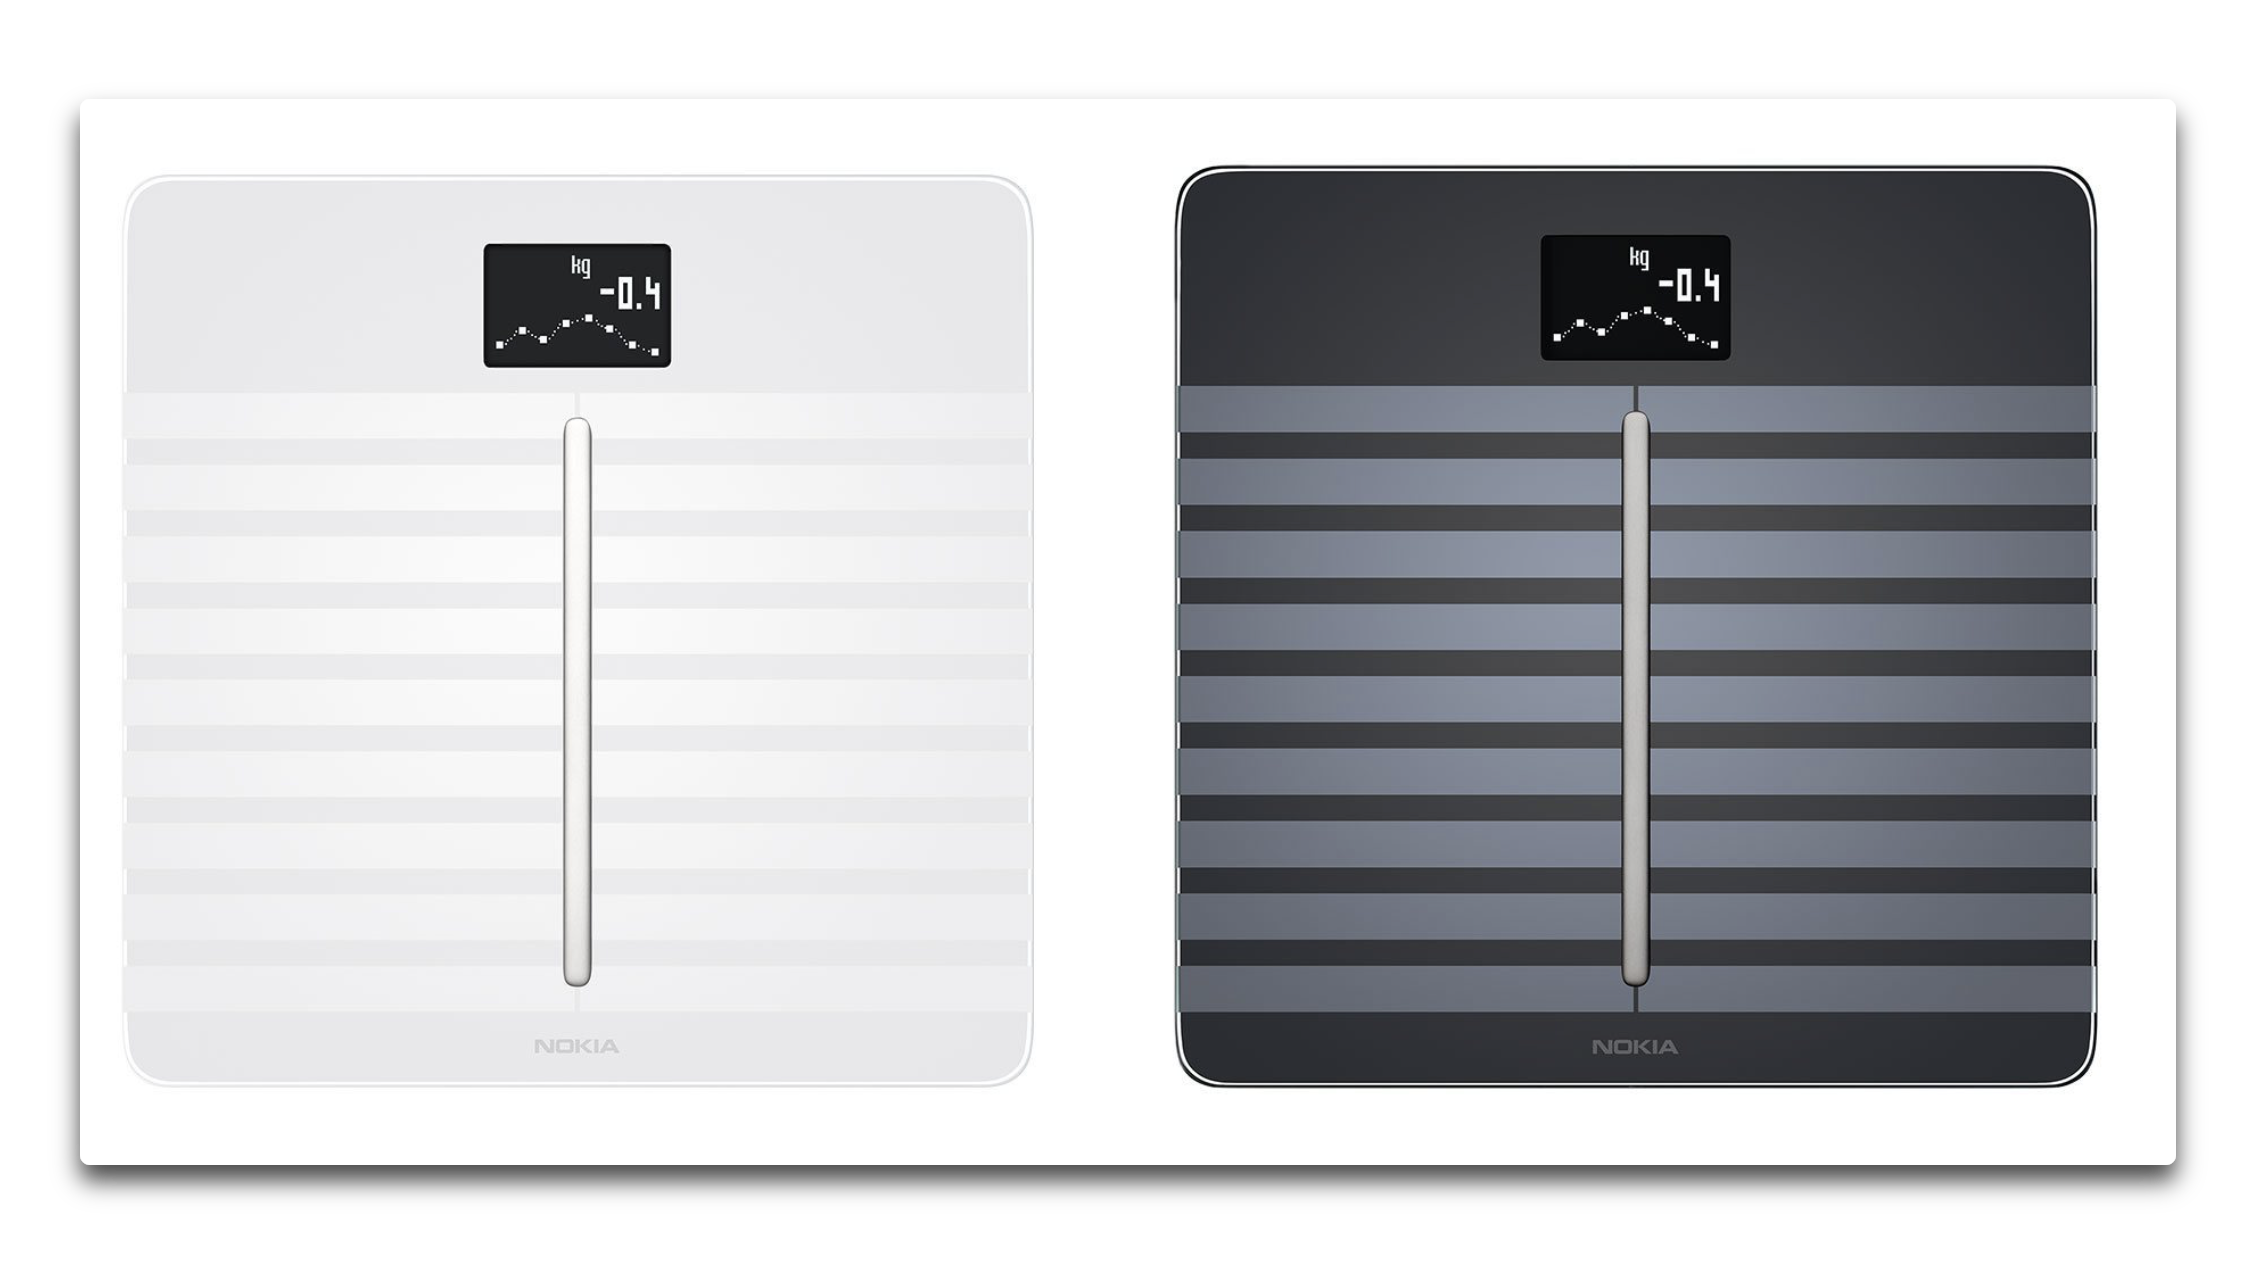 Nokia、iPhoneとWi-Fiで同期するスマート体重計「Body Cardio」の機能を大幅に削減する